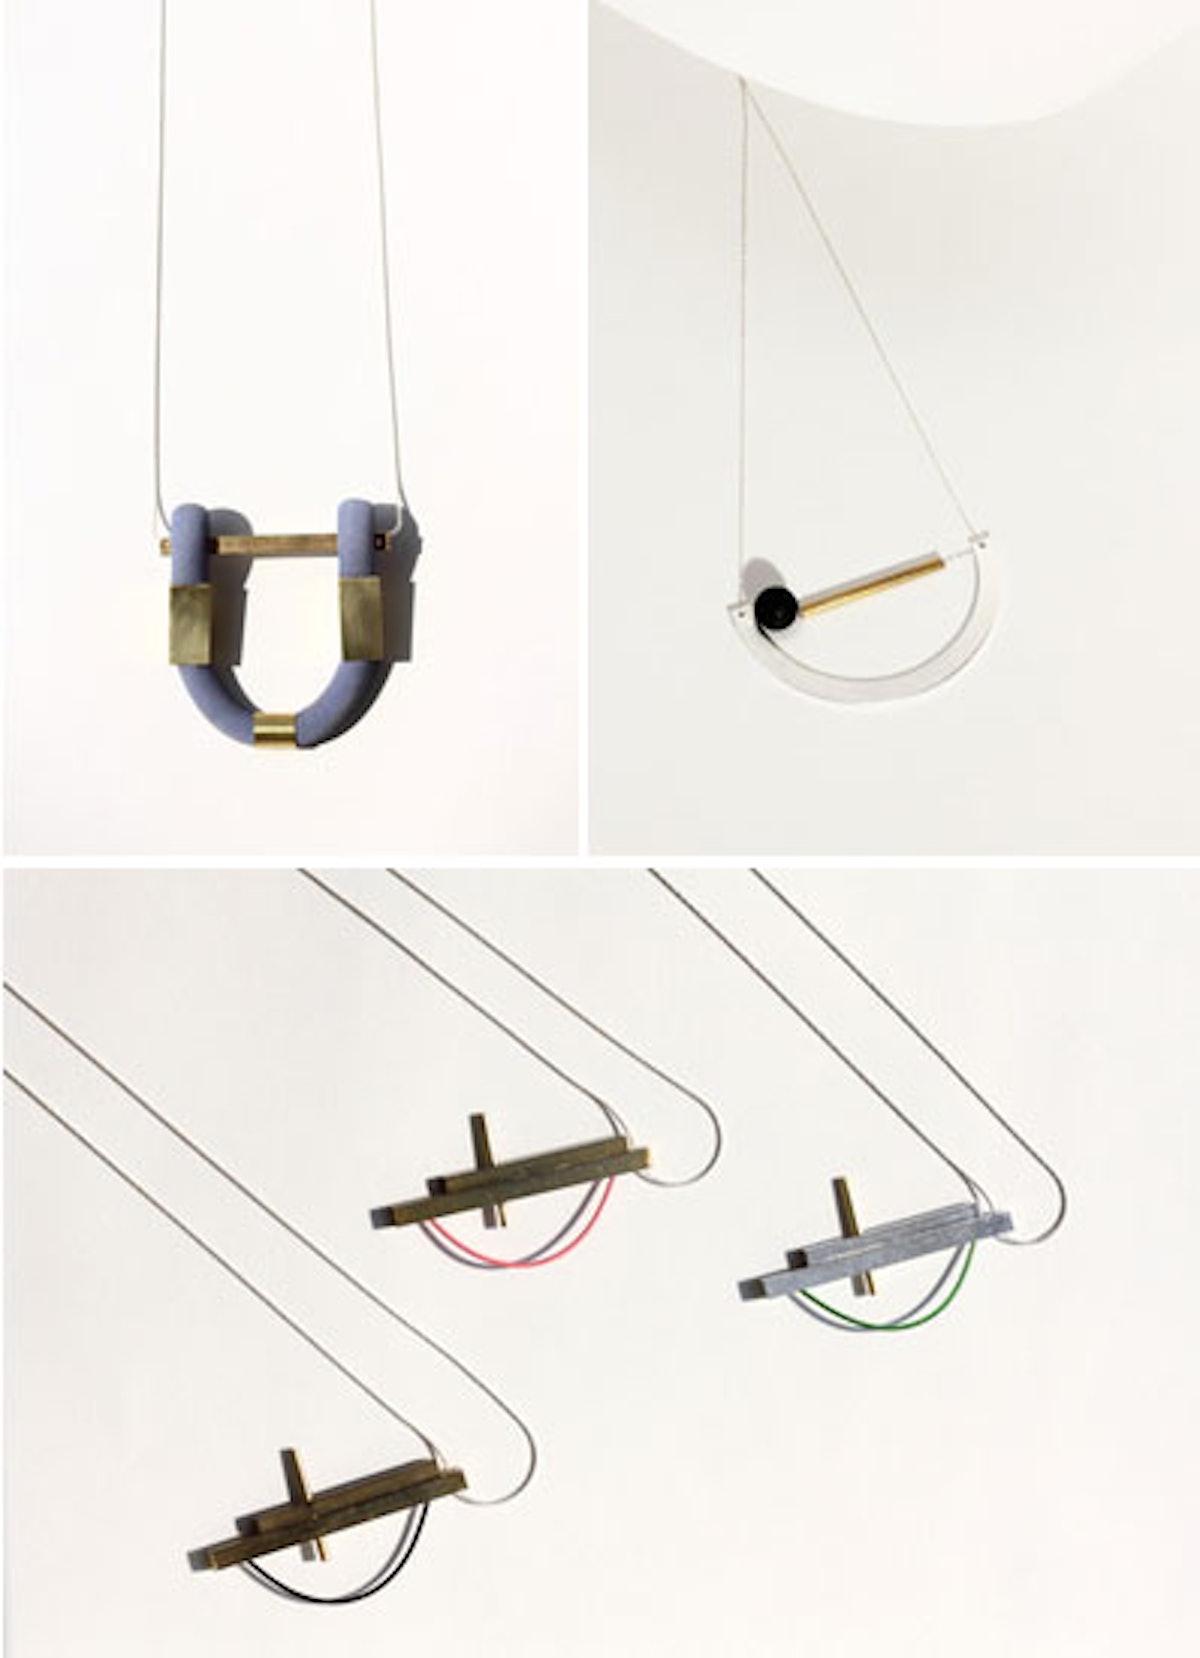 acss-brooklyn-jewelry-05-v.jpg